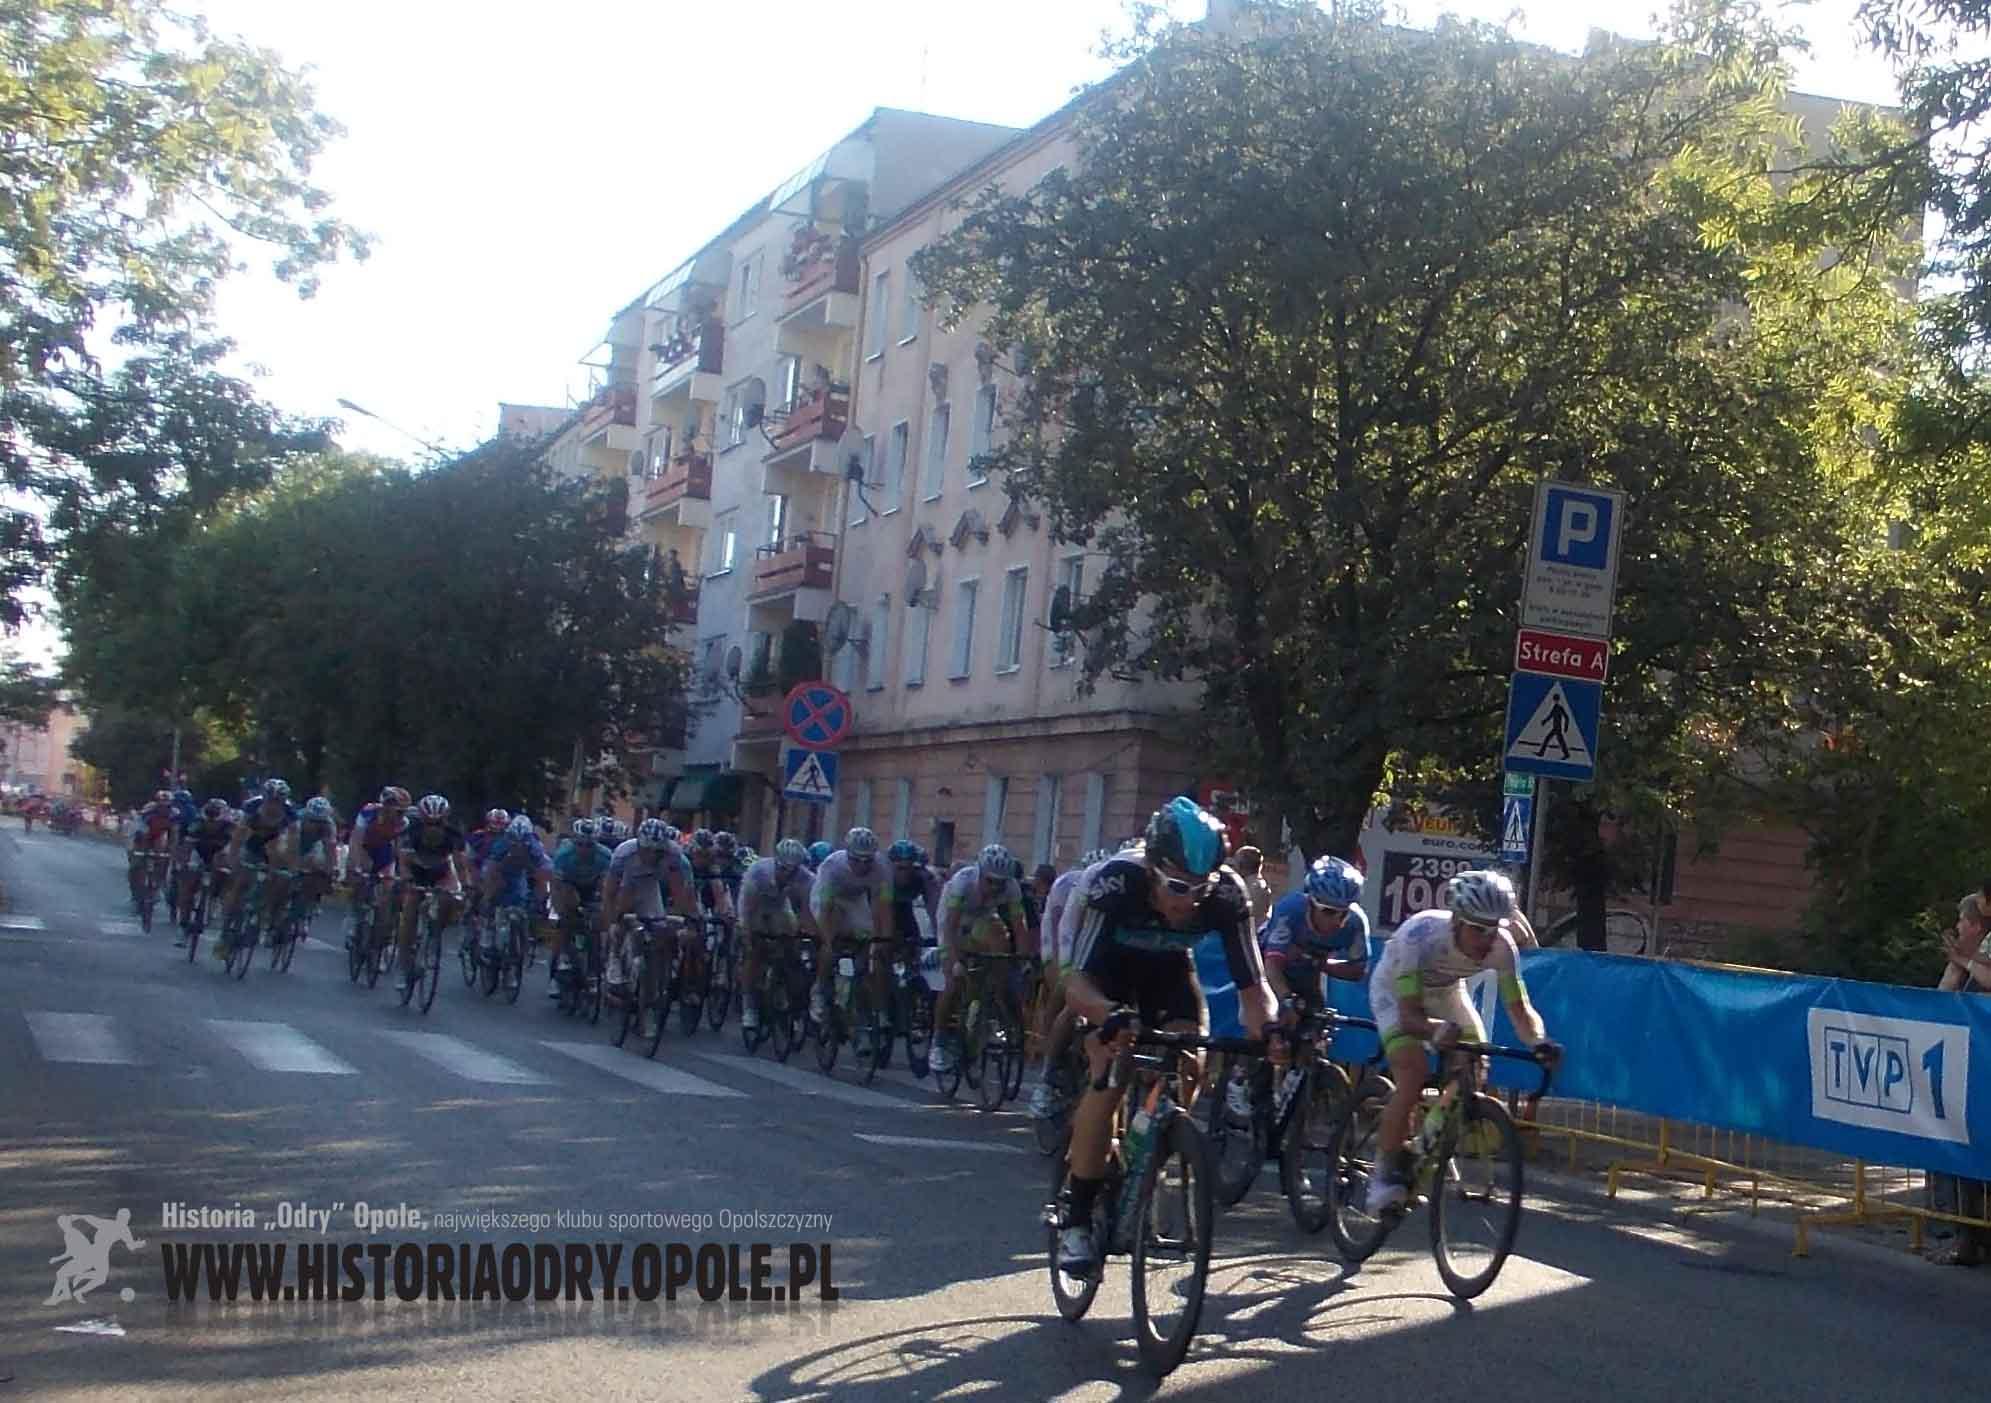 Tour de Pologne na ulicach Opola (2).